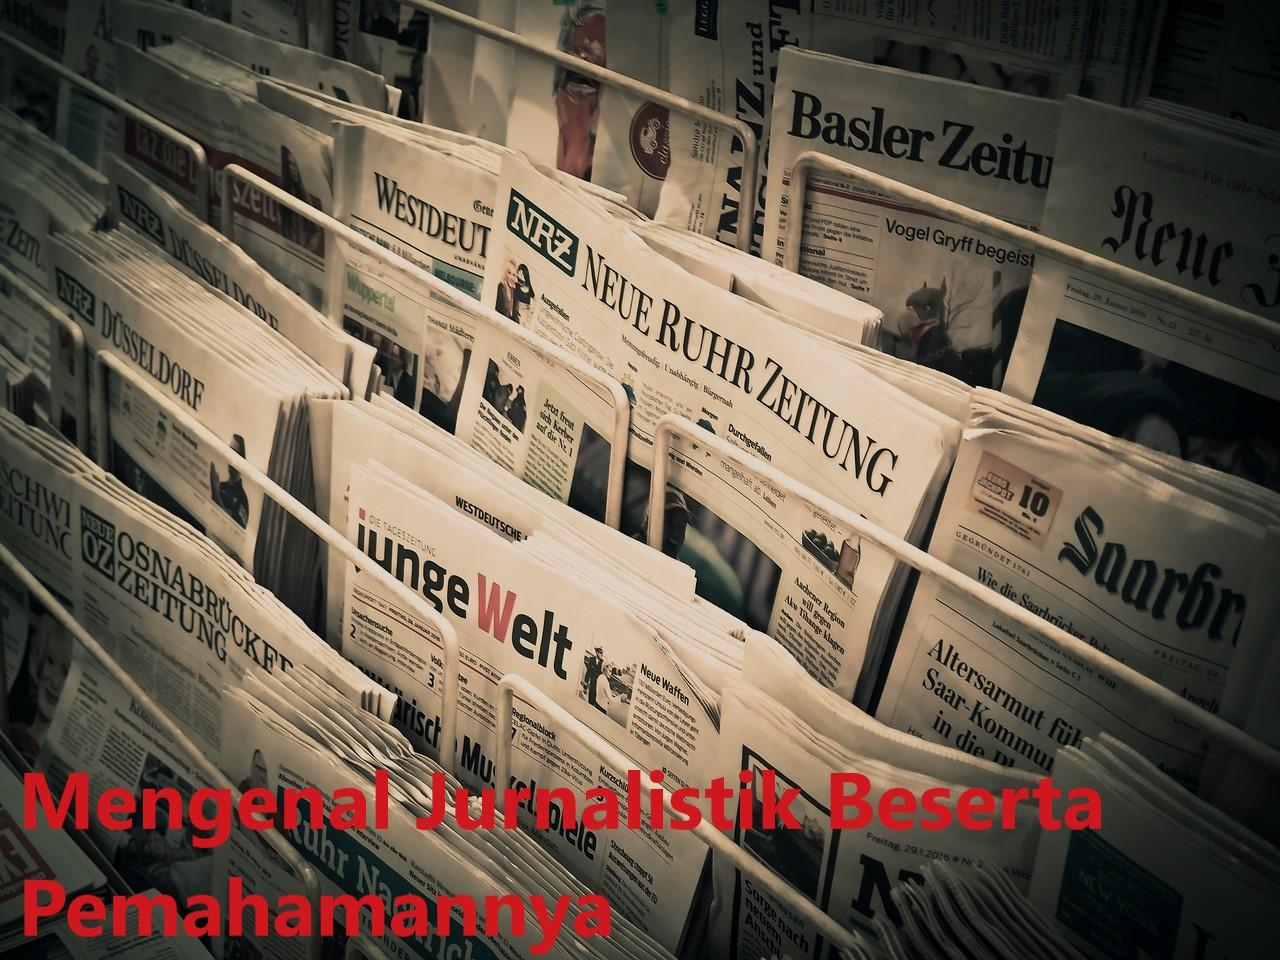 Mengenal Jurnalistik Beserta Pemahamannya